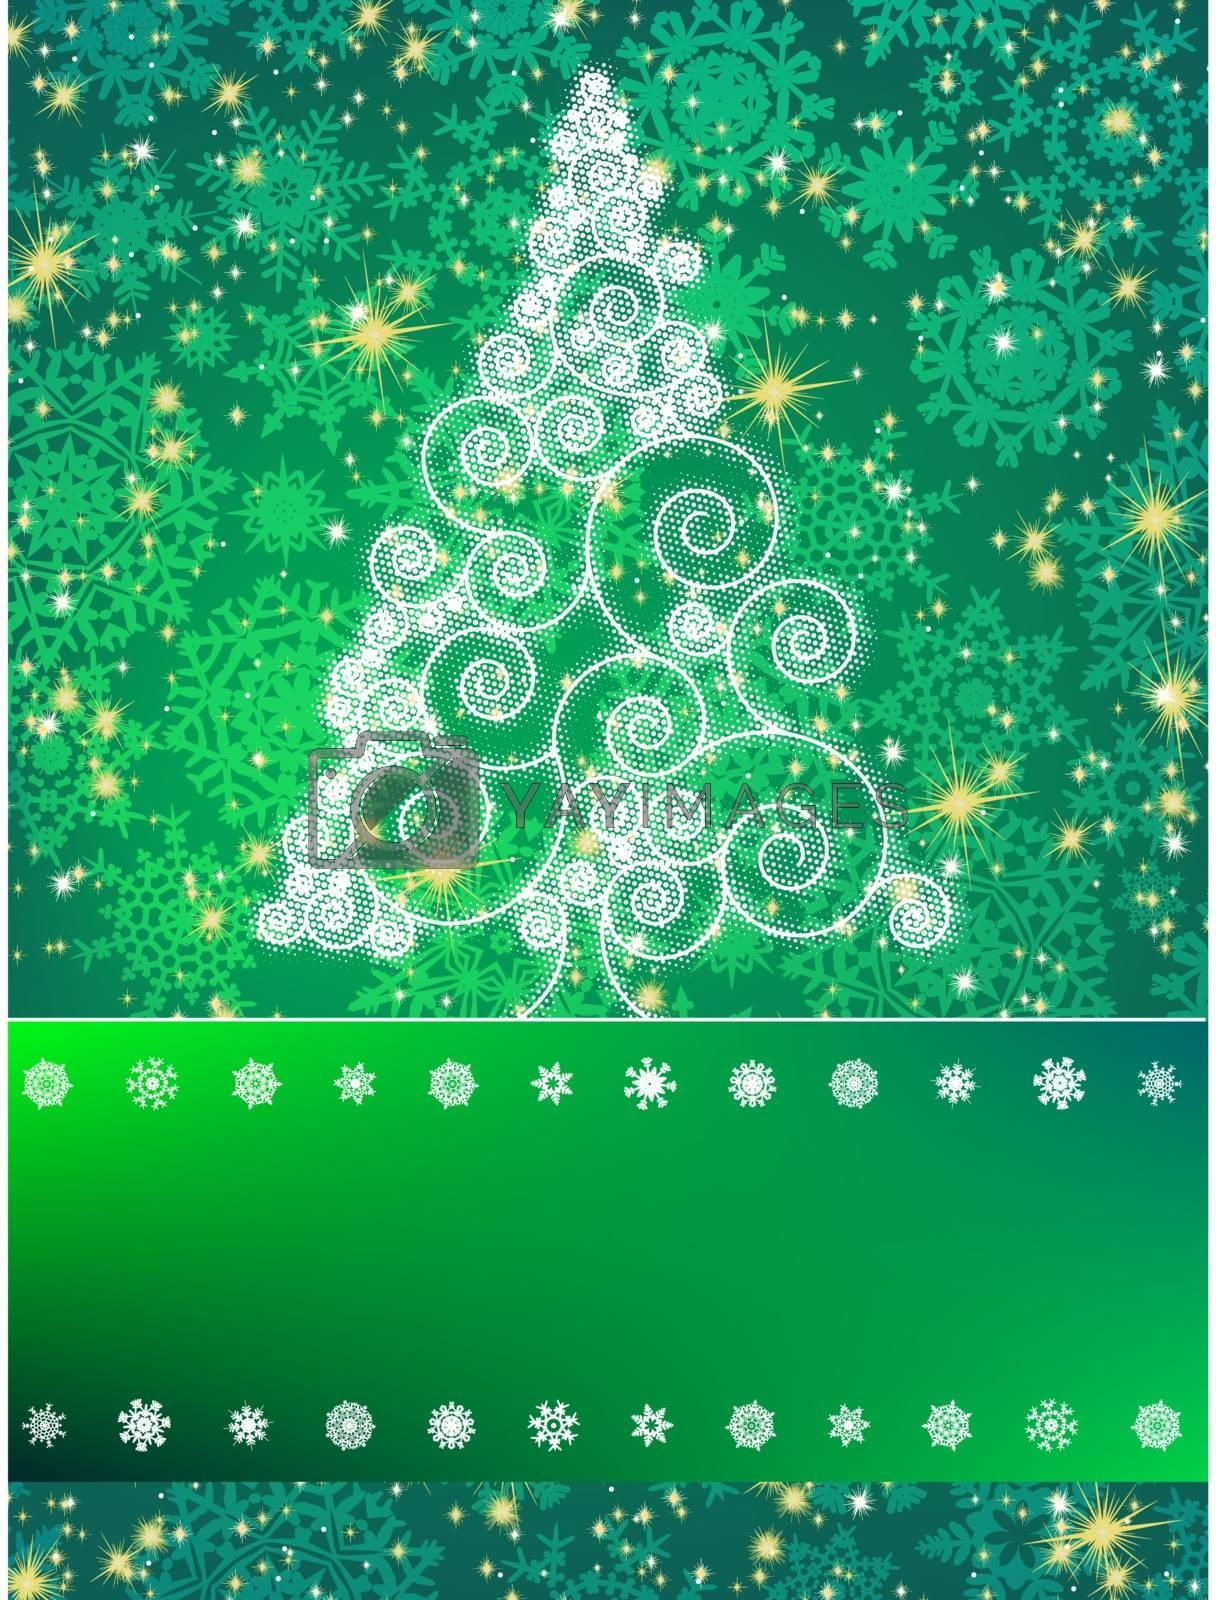 Elegant christmas background. EPS 8 by Petrov_Vladimir